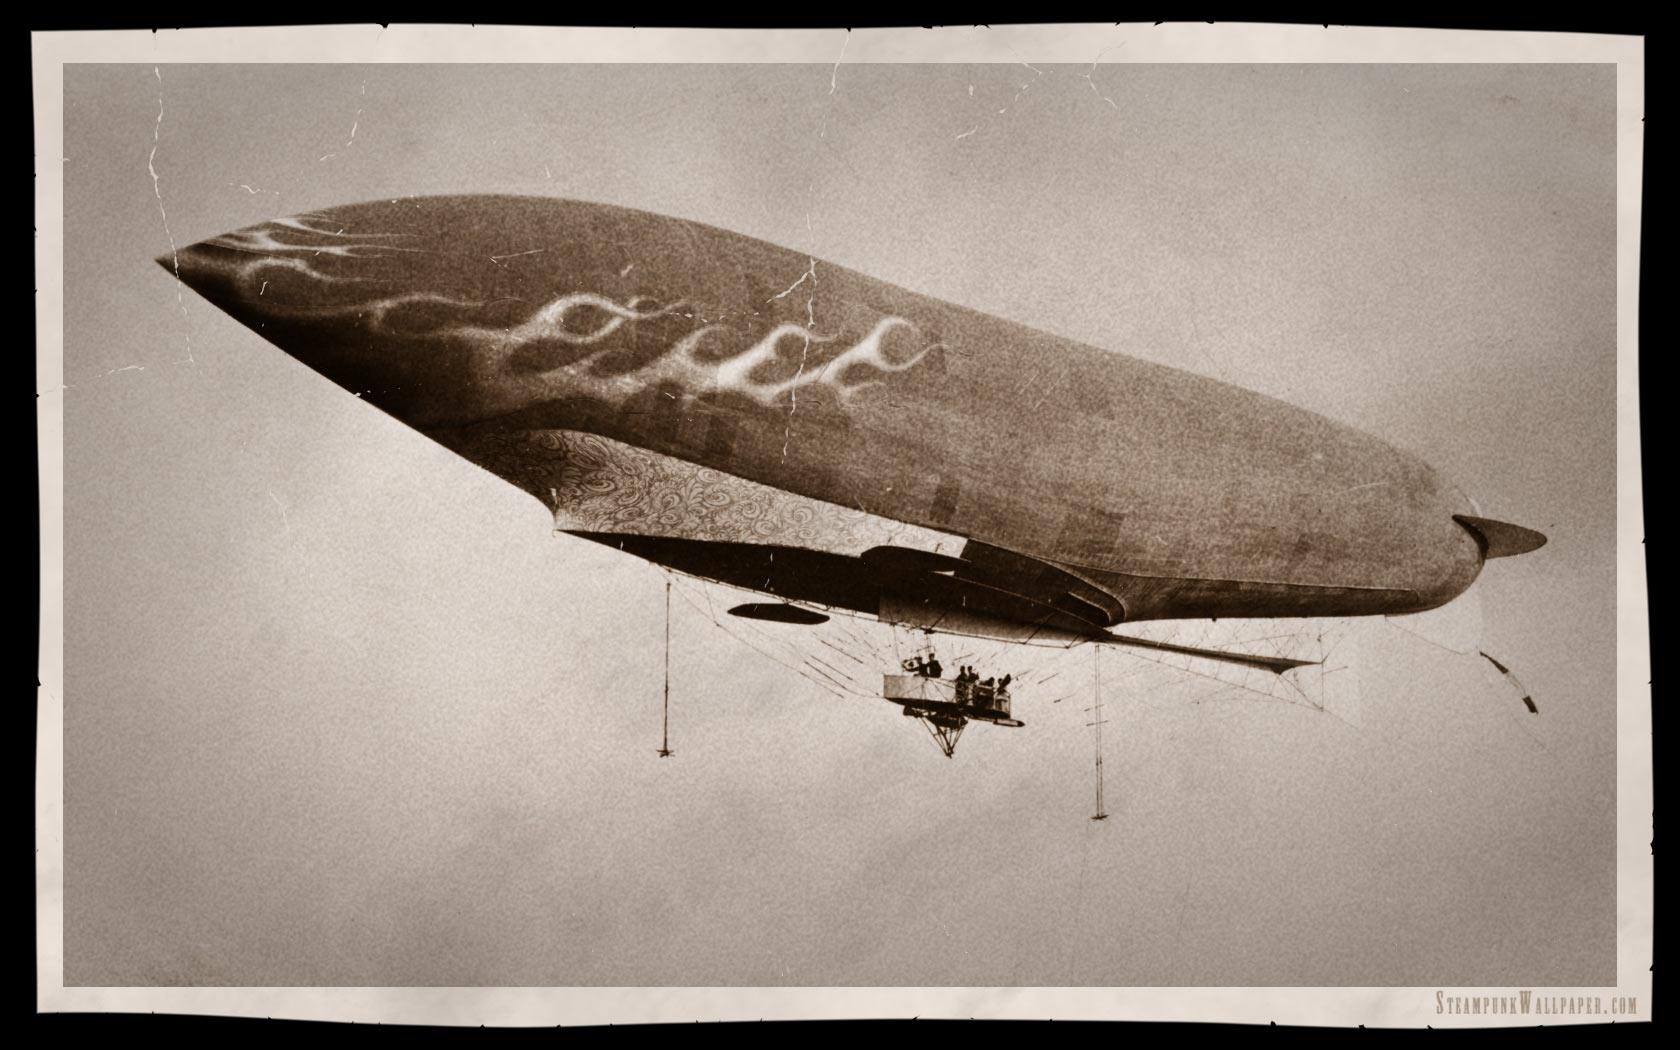 airship_zippelin_desktop_1680x1050_hd-wallpaper-29243